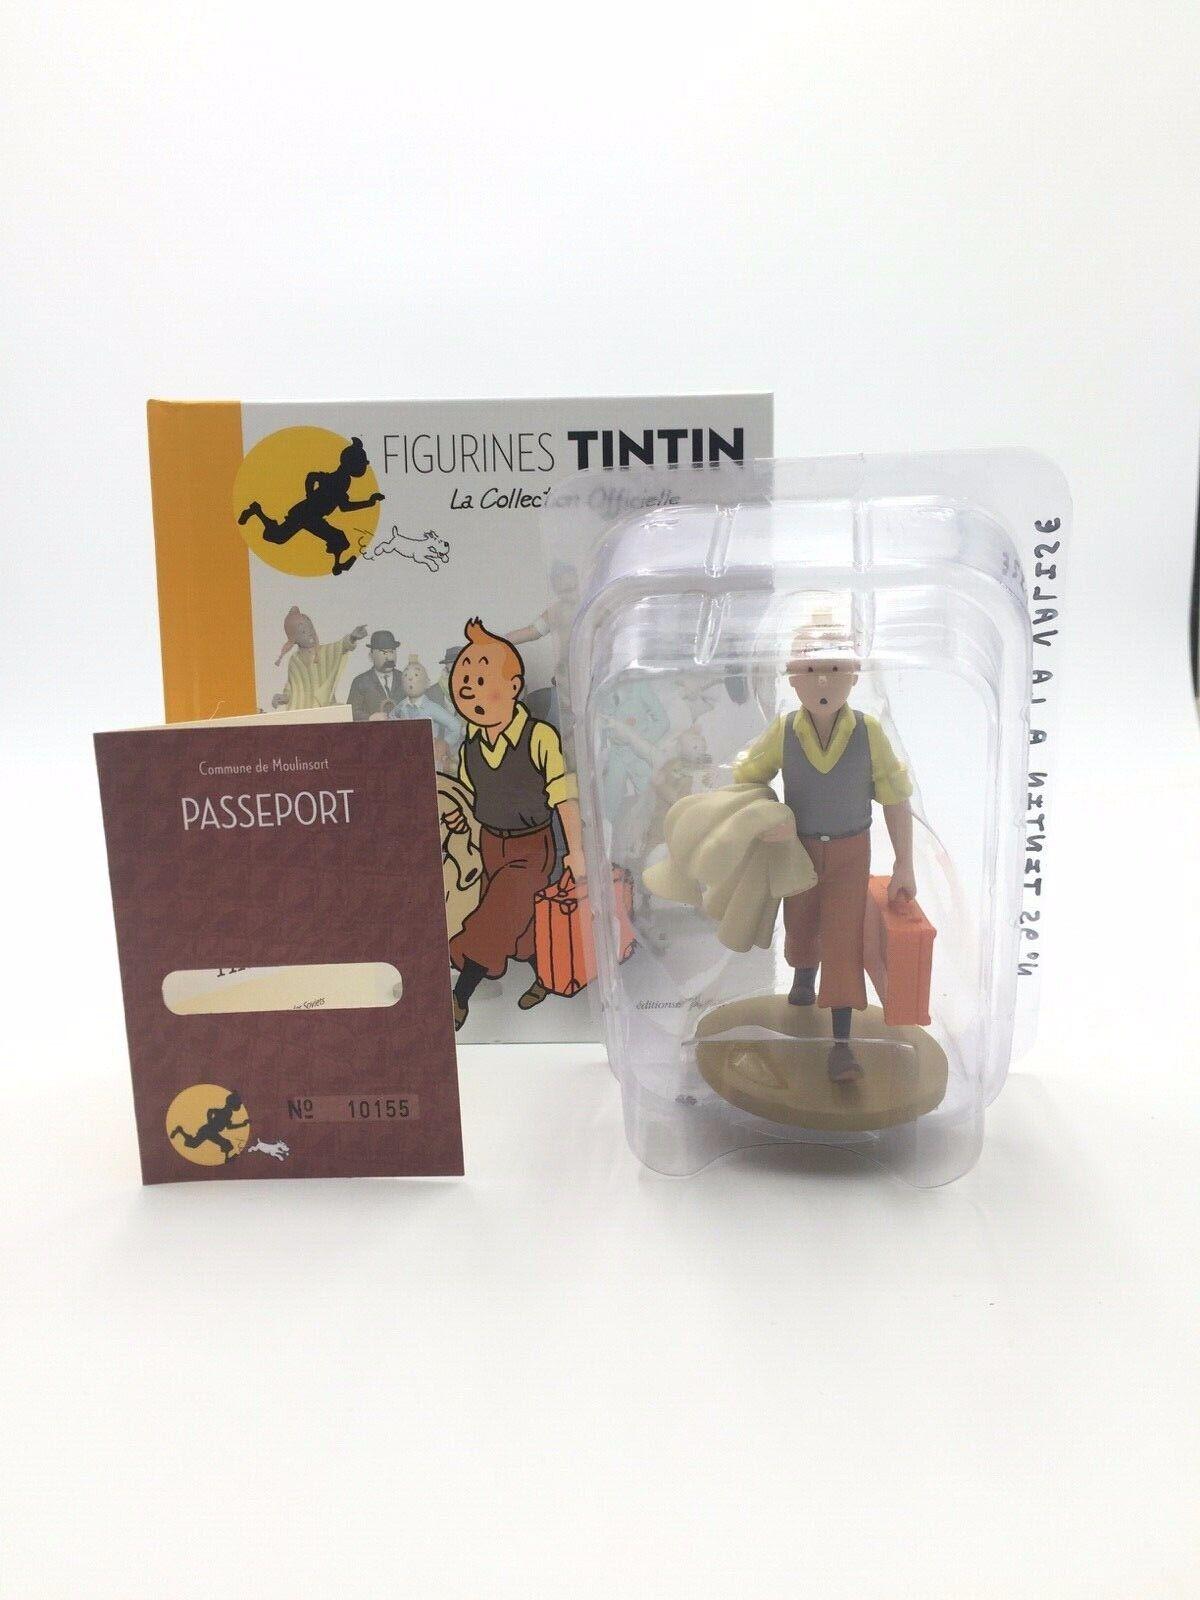 Tintin  Figurine n95 tintin à la la la valise coque neuf   livret passeport 8ba57e